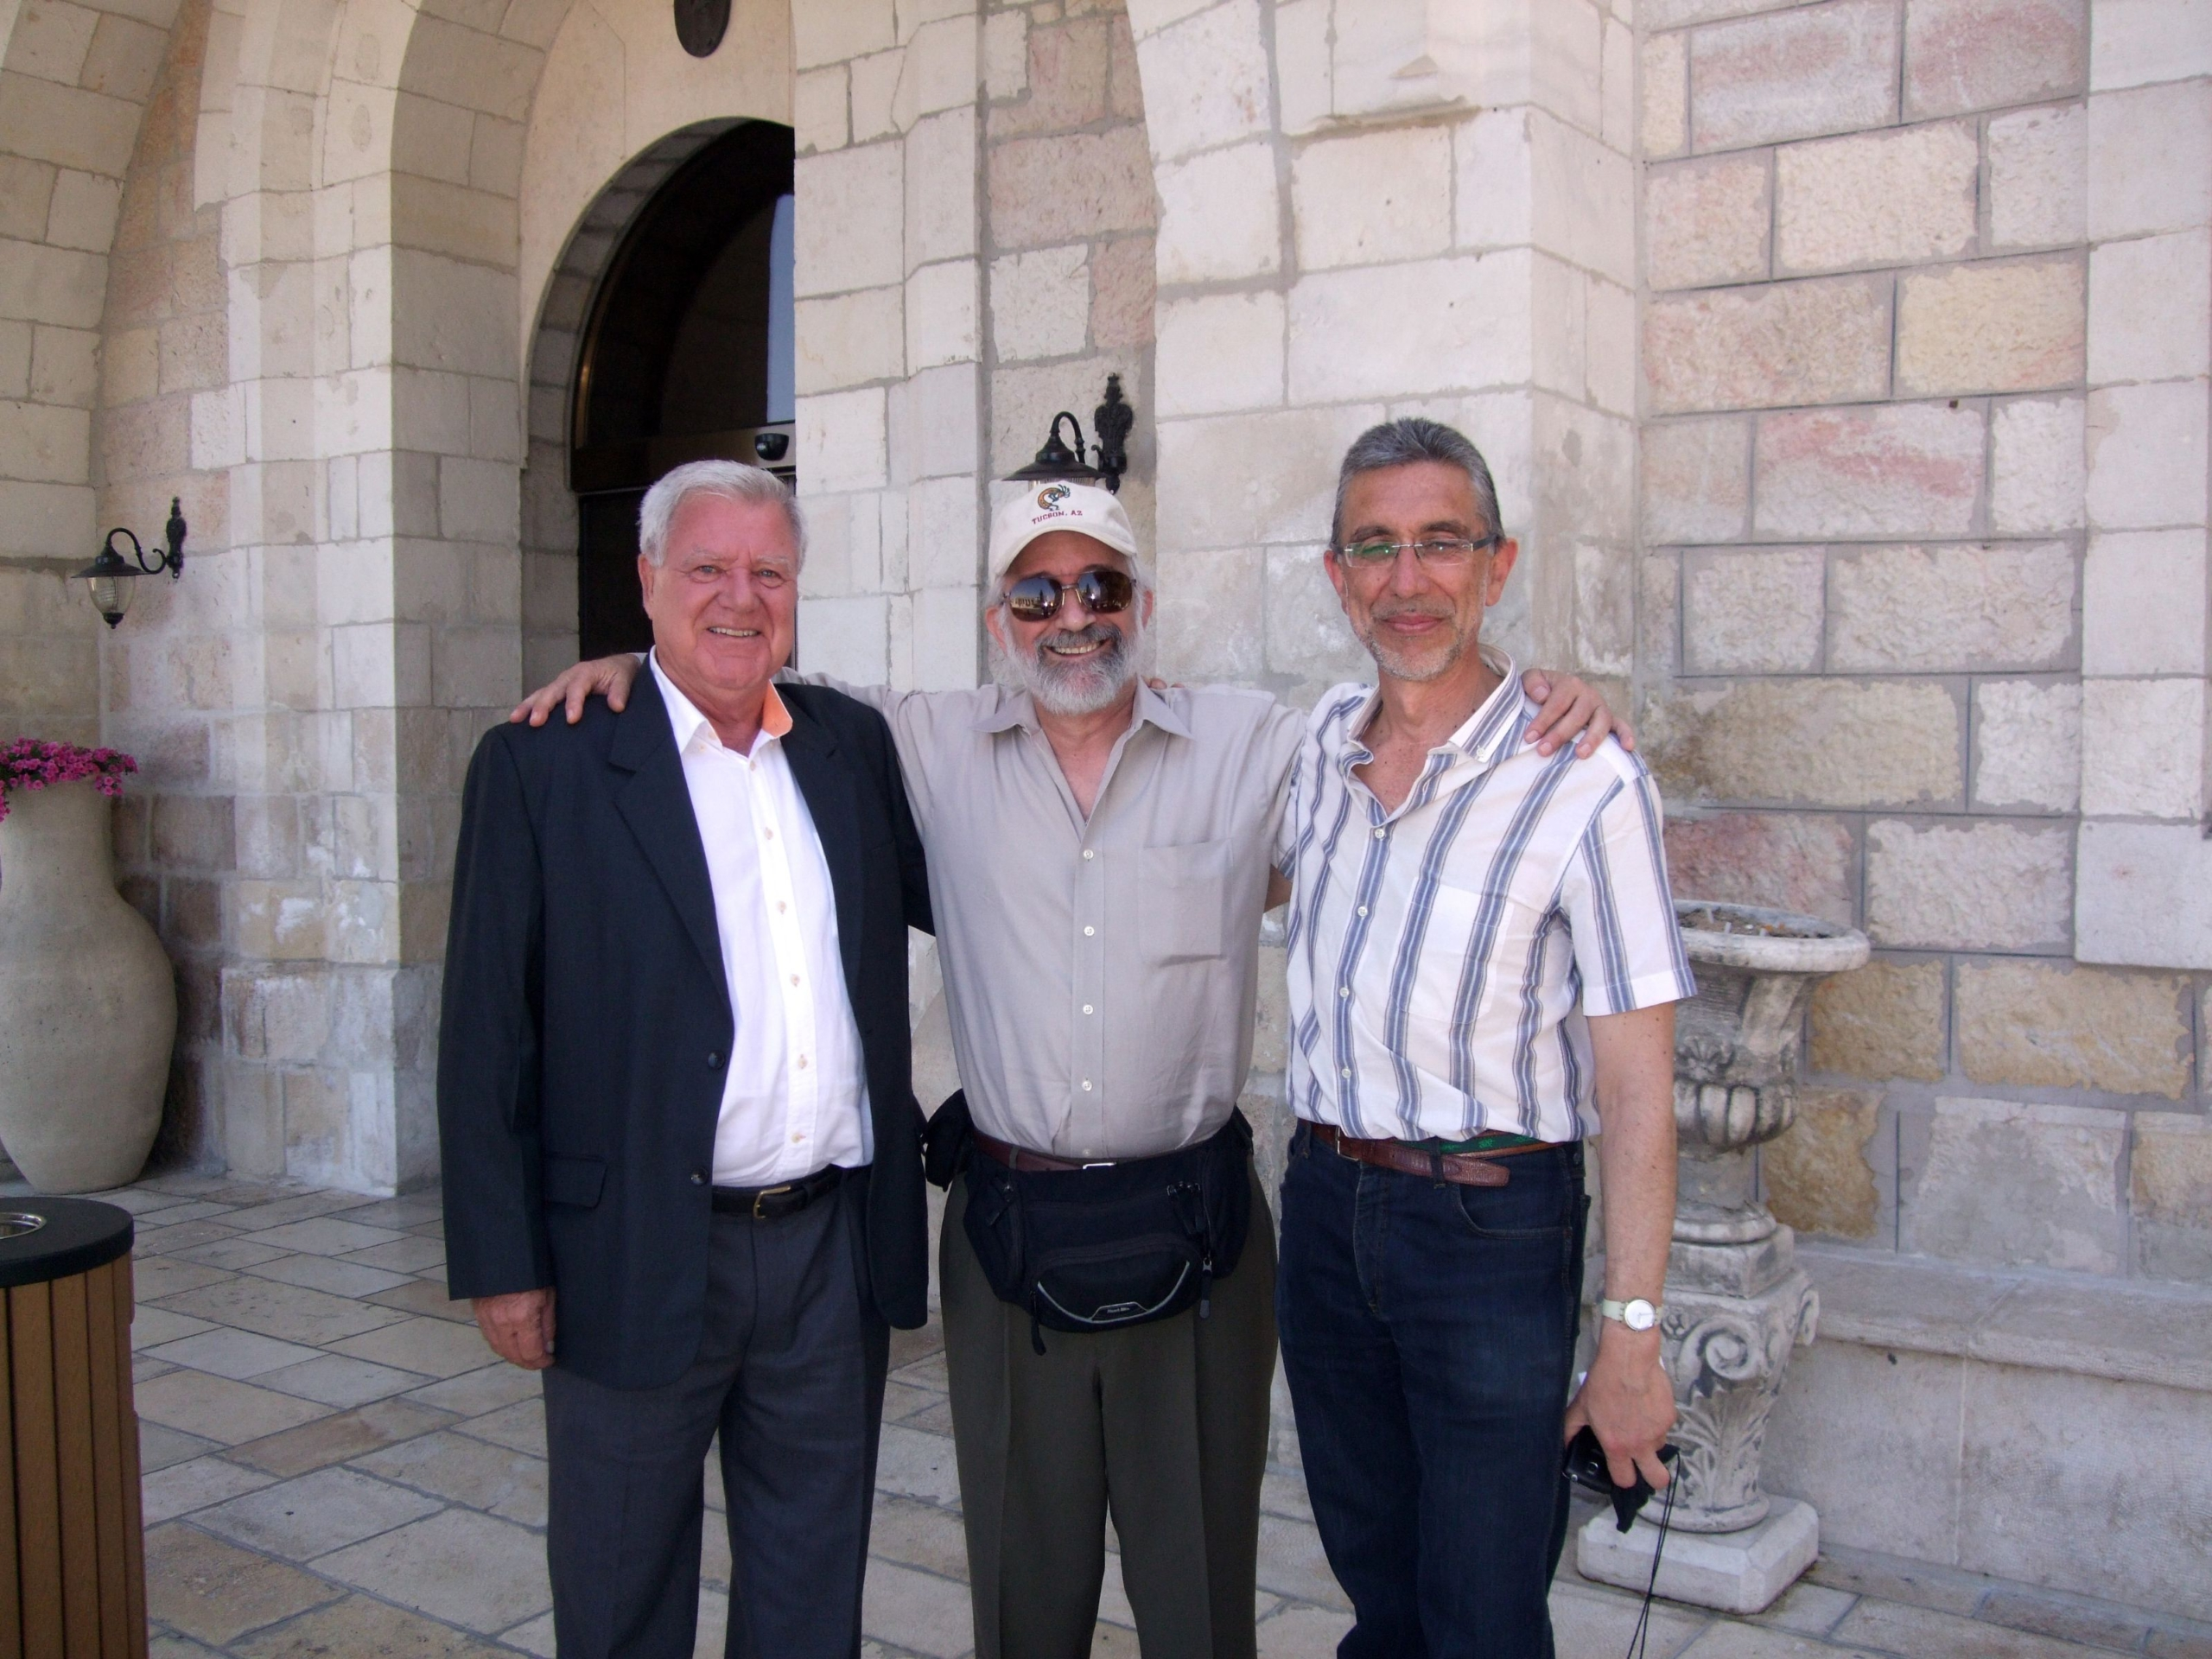 Dr. Soons, Barrie Schwortz, Paolo Di Lazaro